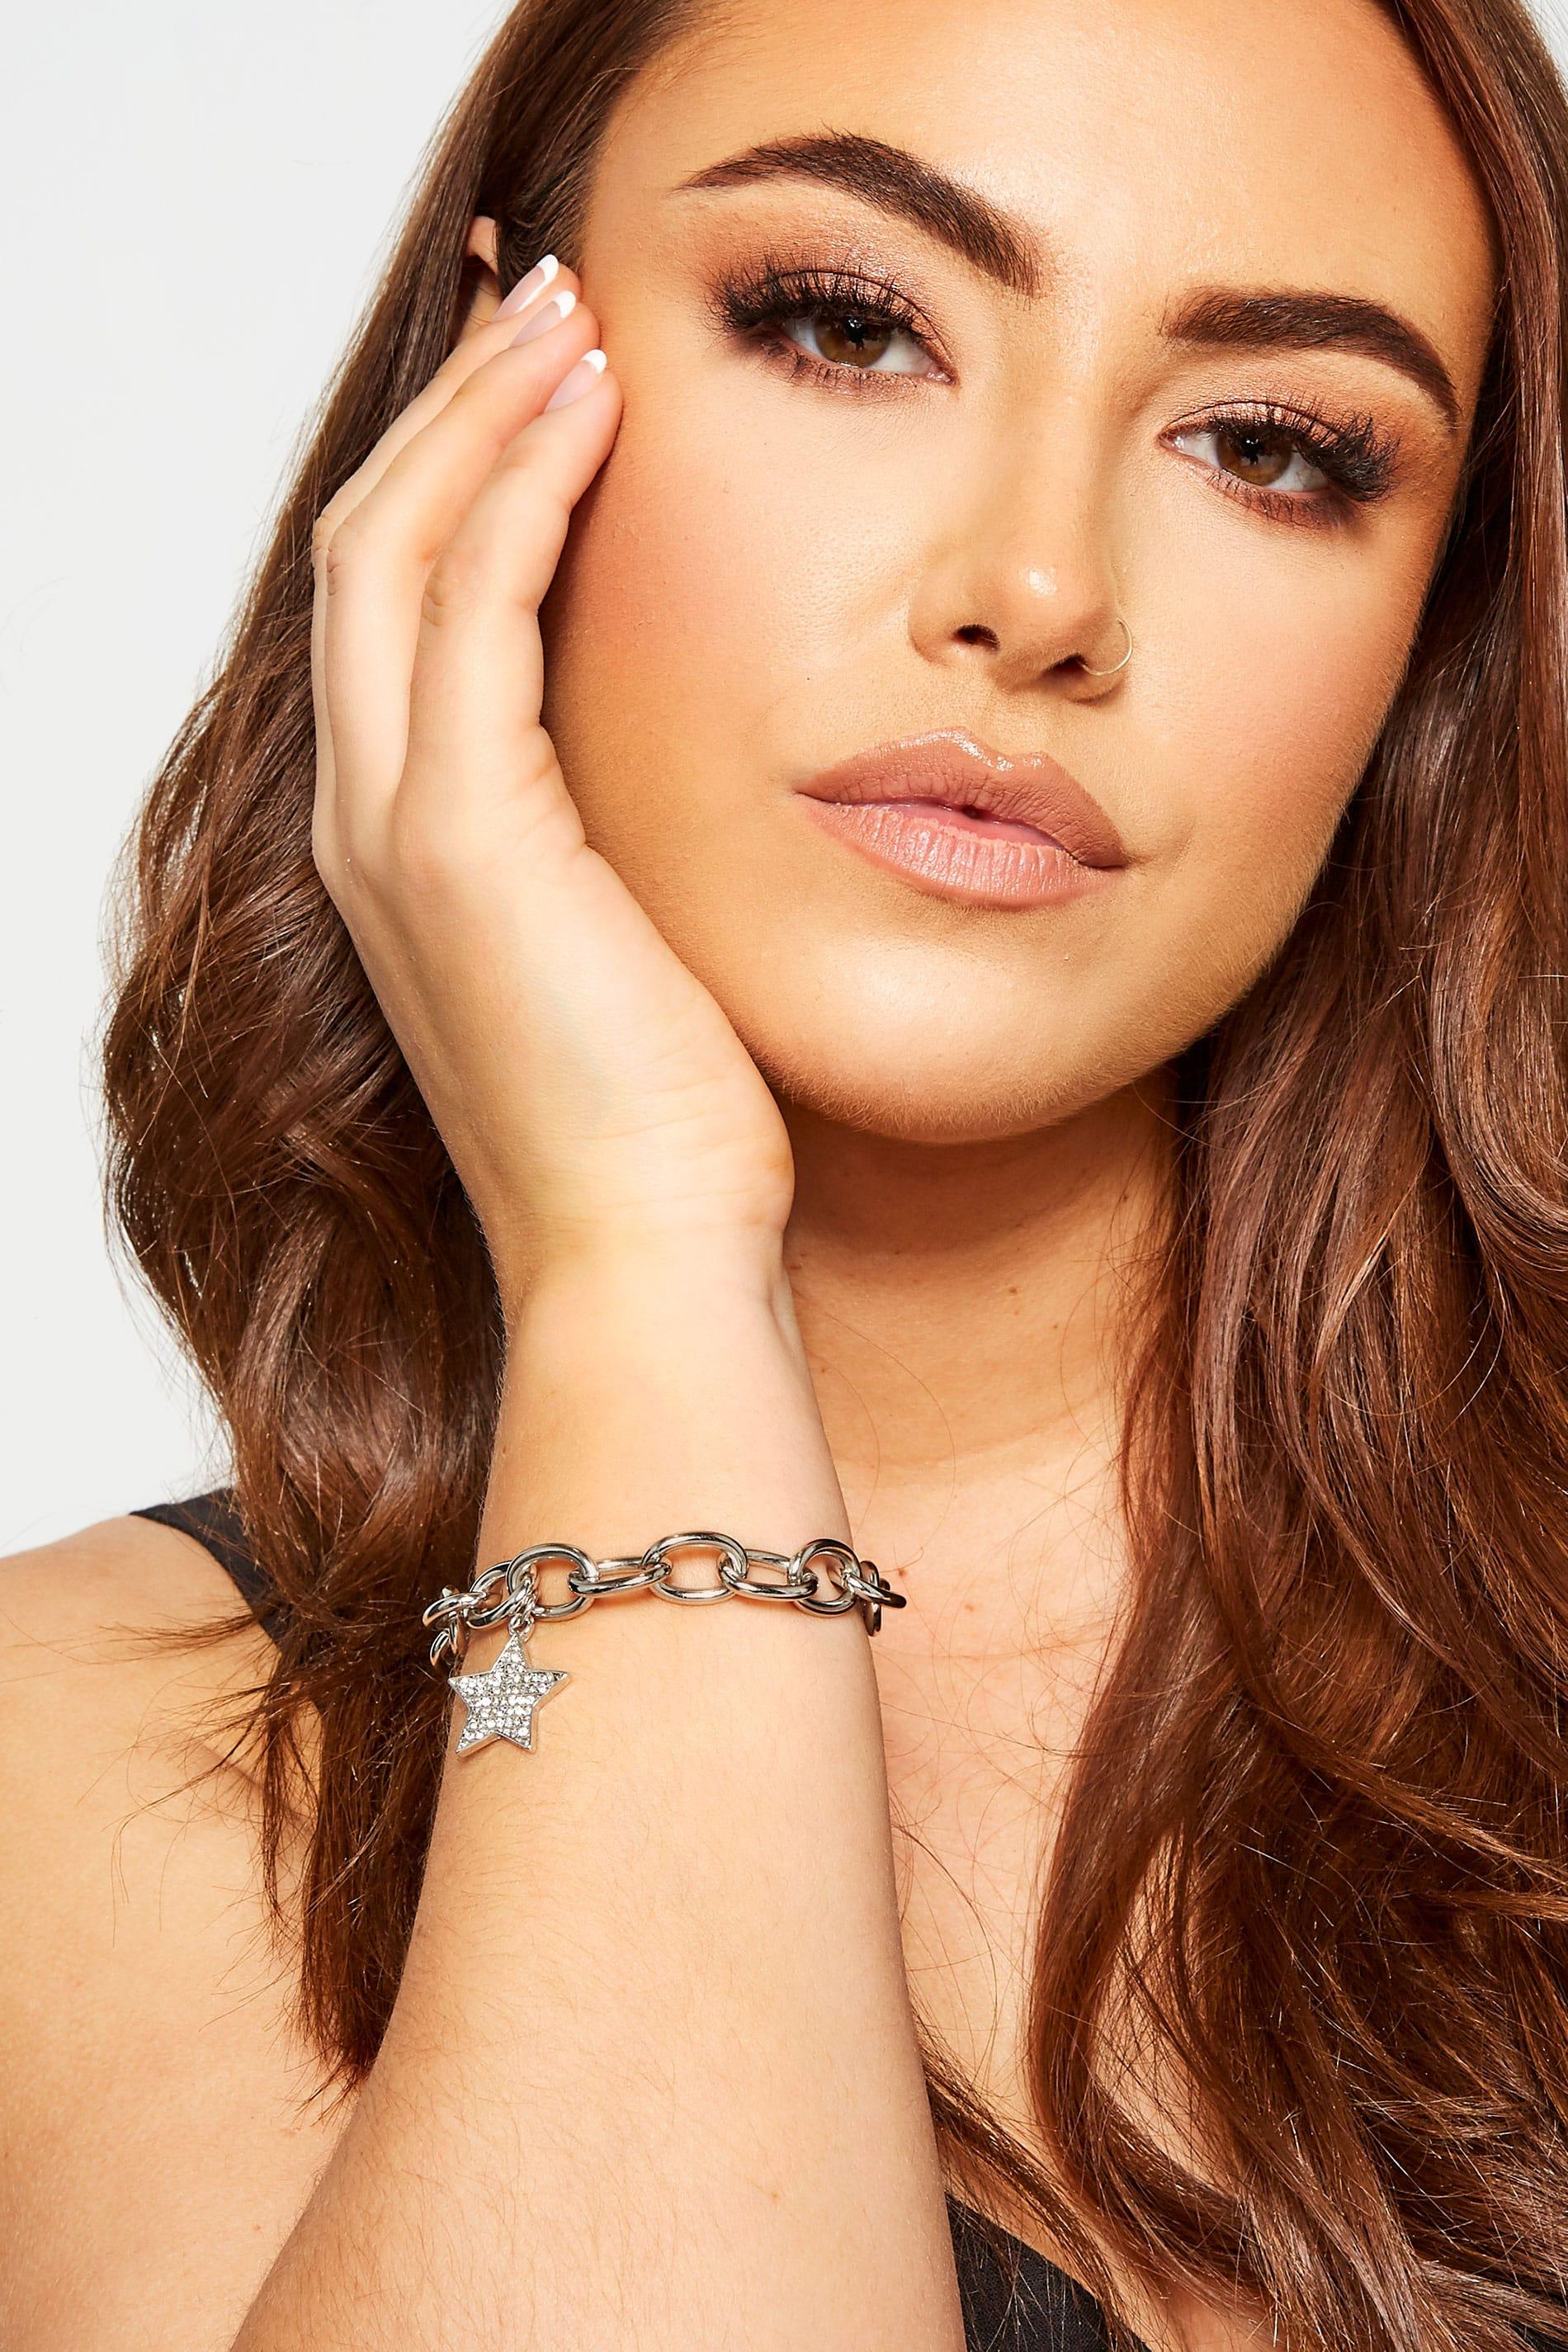 Silver Star Charm Chain Bracelet